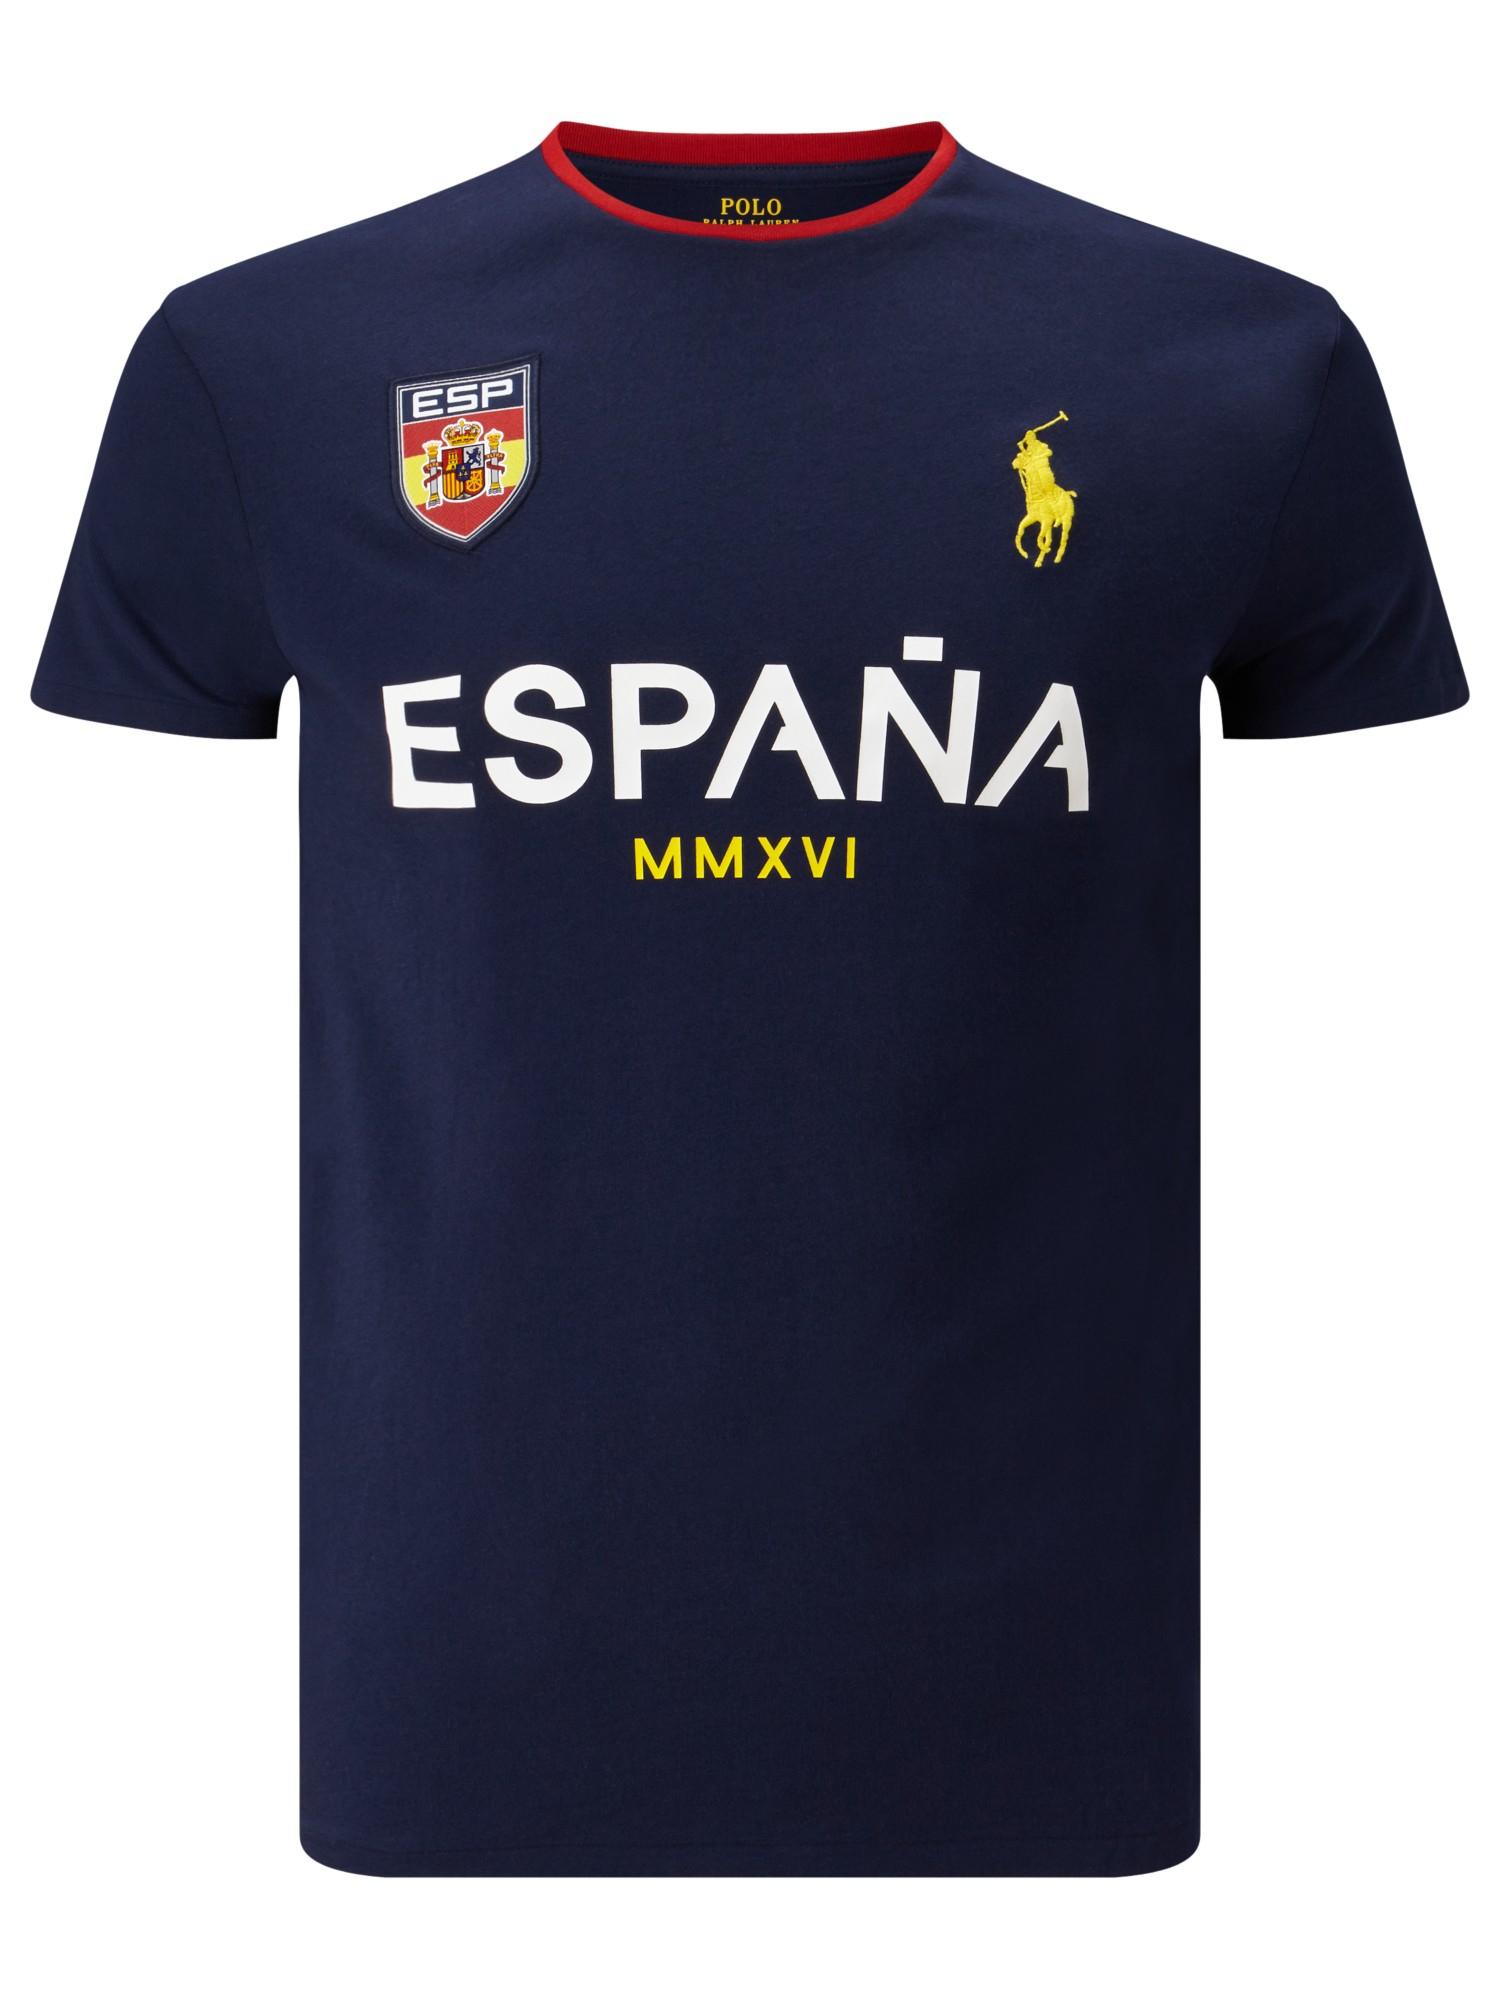 Lyst polo ralph lauren spain short sleeve crew neck t for Spain polo shirt 2014